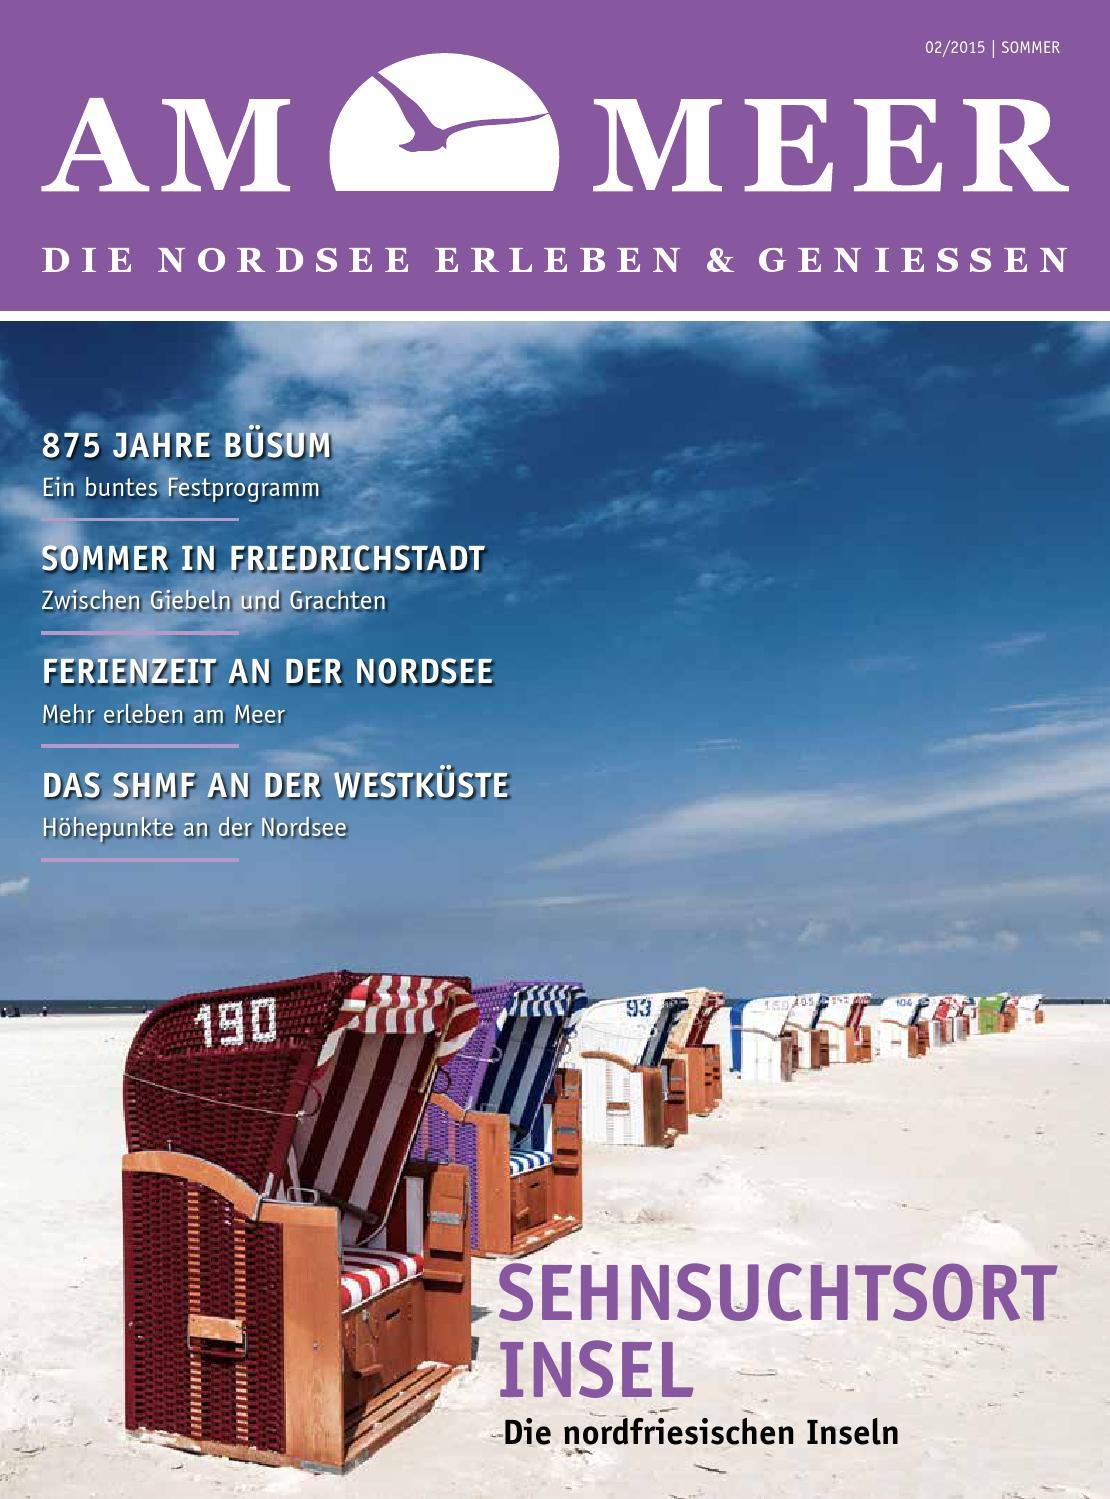 AM MEER 02 2015 by Anuschka Horns - issuu